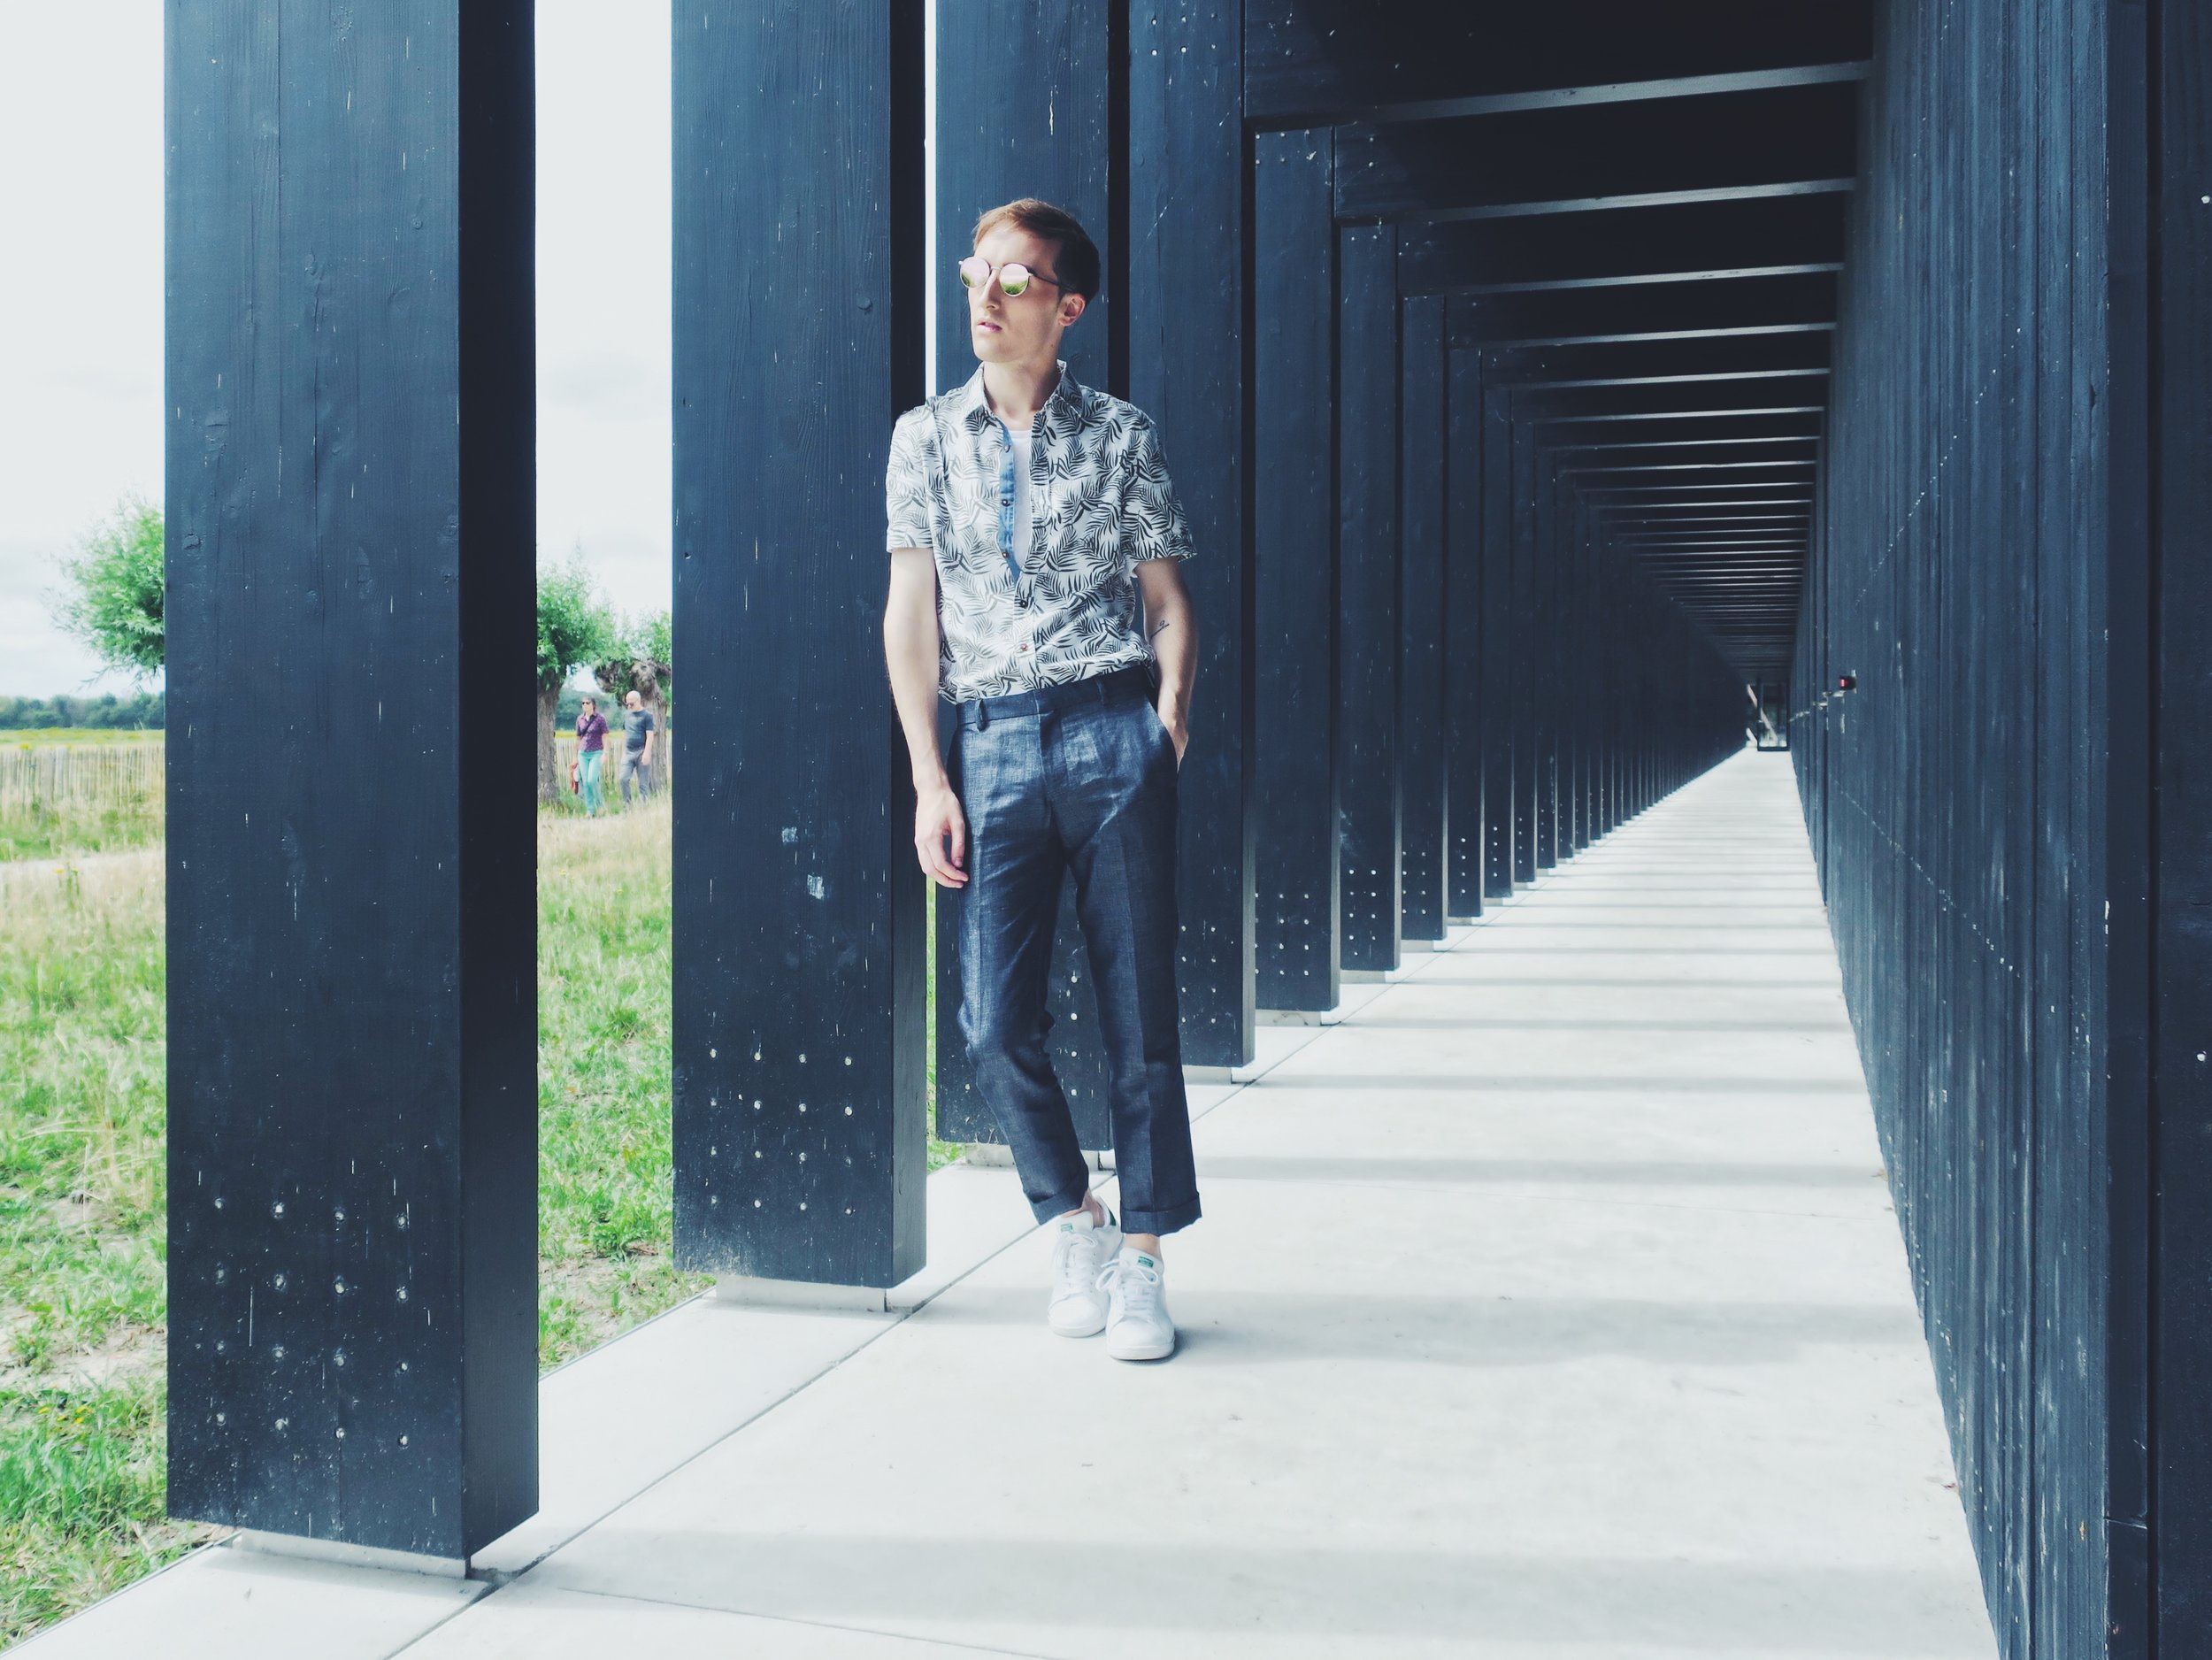 Original Penguin shirt - Essentiel t-shirt - Topman trousers - Adidas Stan Smith sneakers - Komono sunglasses